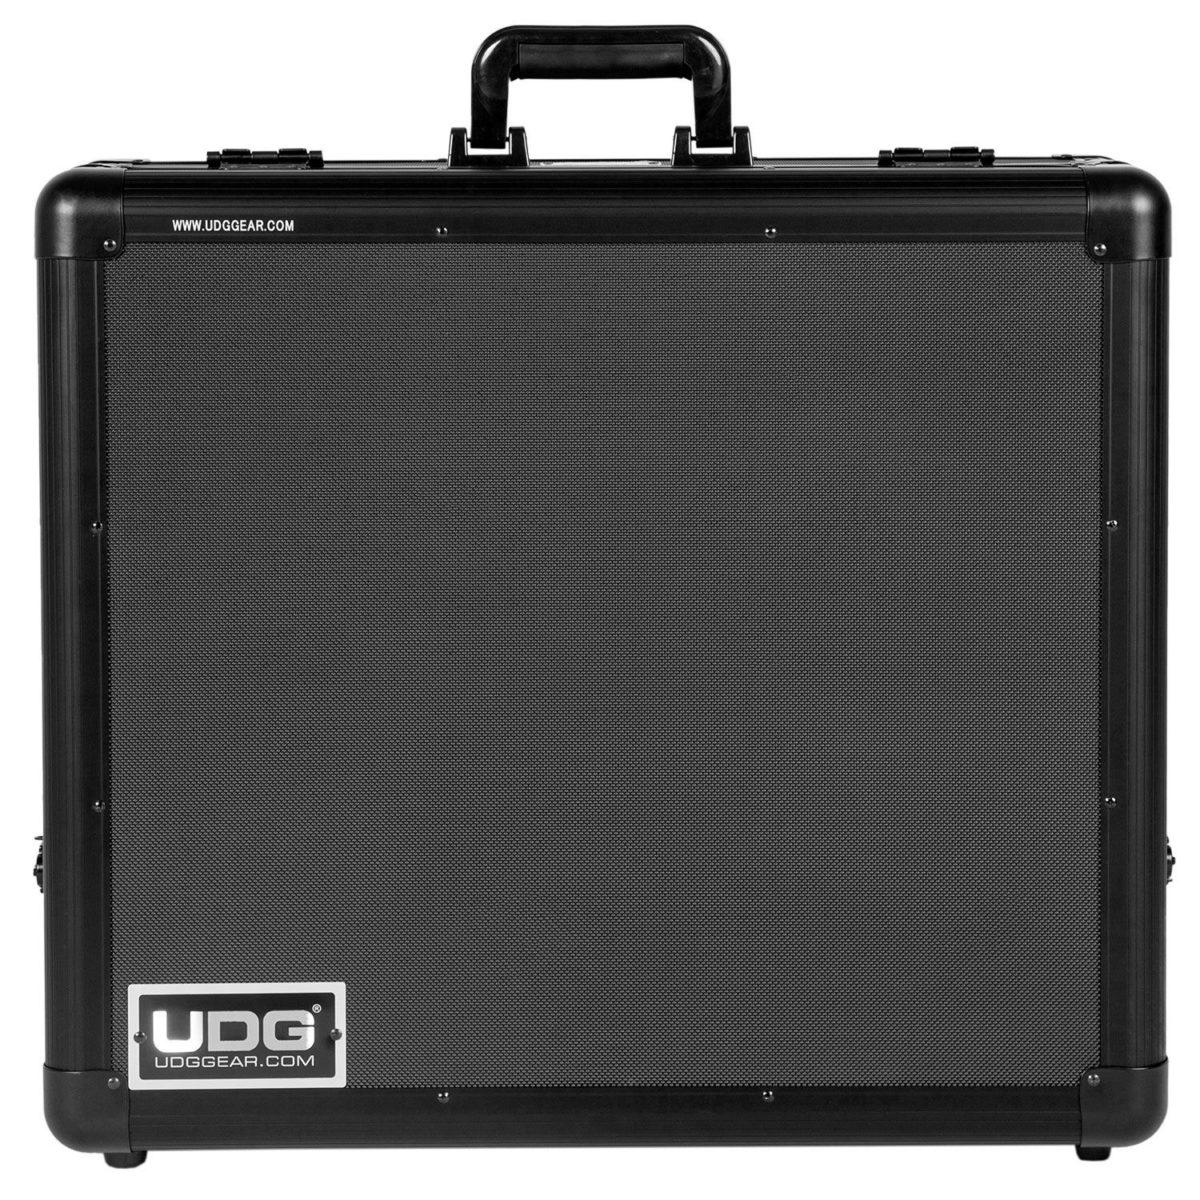 Case UDG para equipamentos de DJ - U93012BL